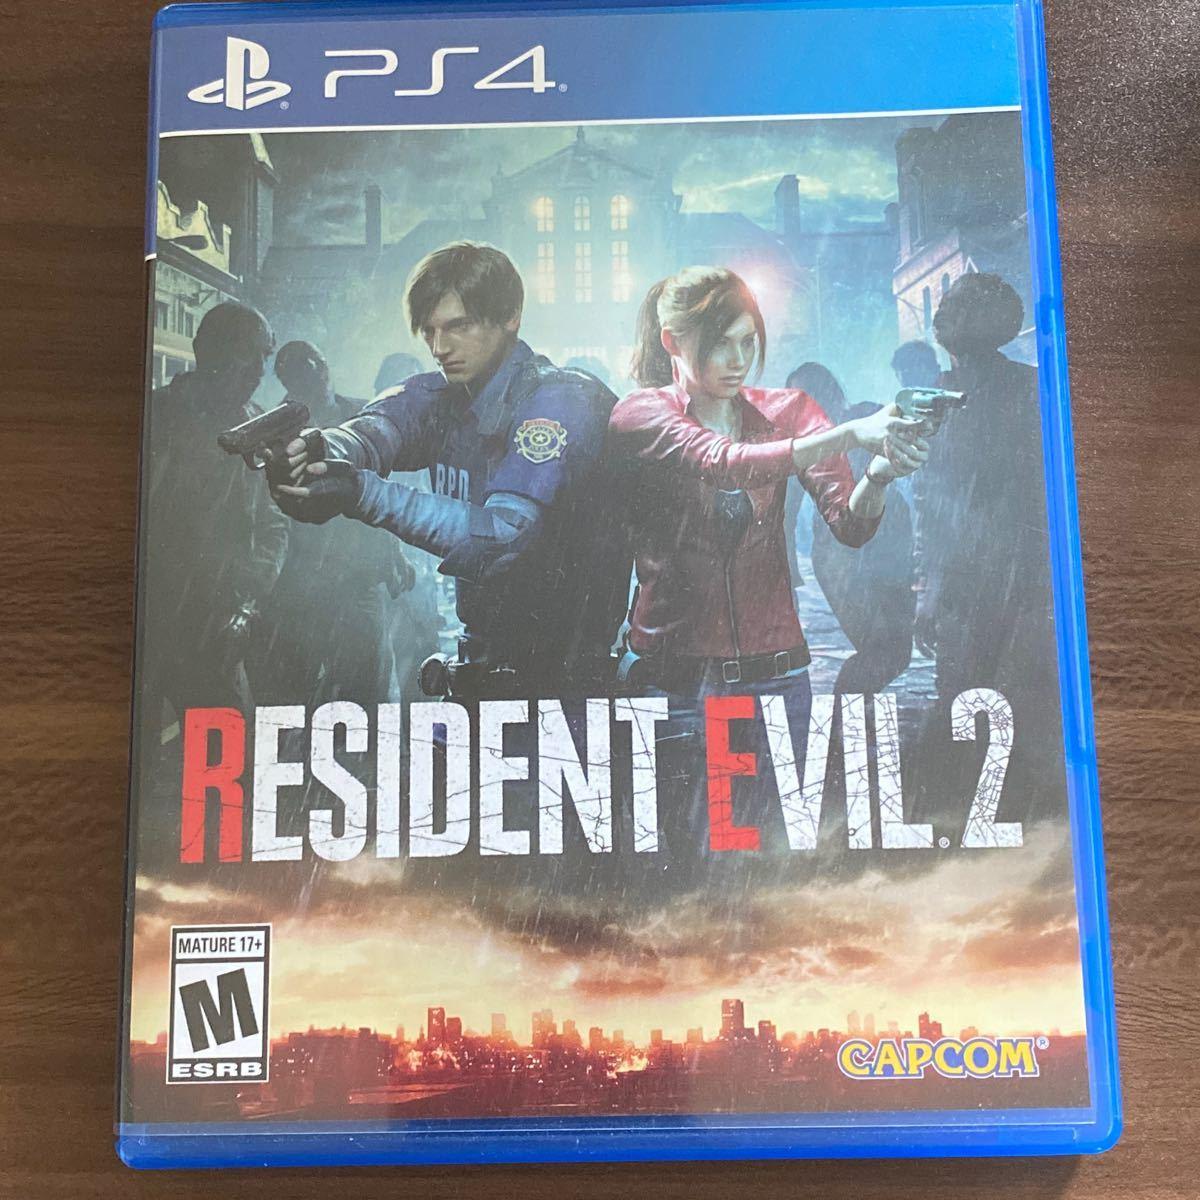 PS4 北米版 RESIDENT EVIL バイオハザードRE:2 PS4ソフト バイオハザードRE2 BIOHAZARD